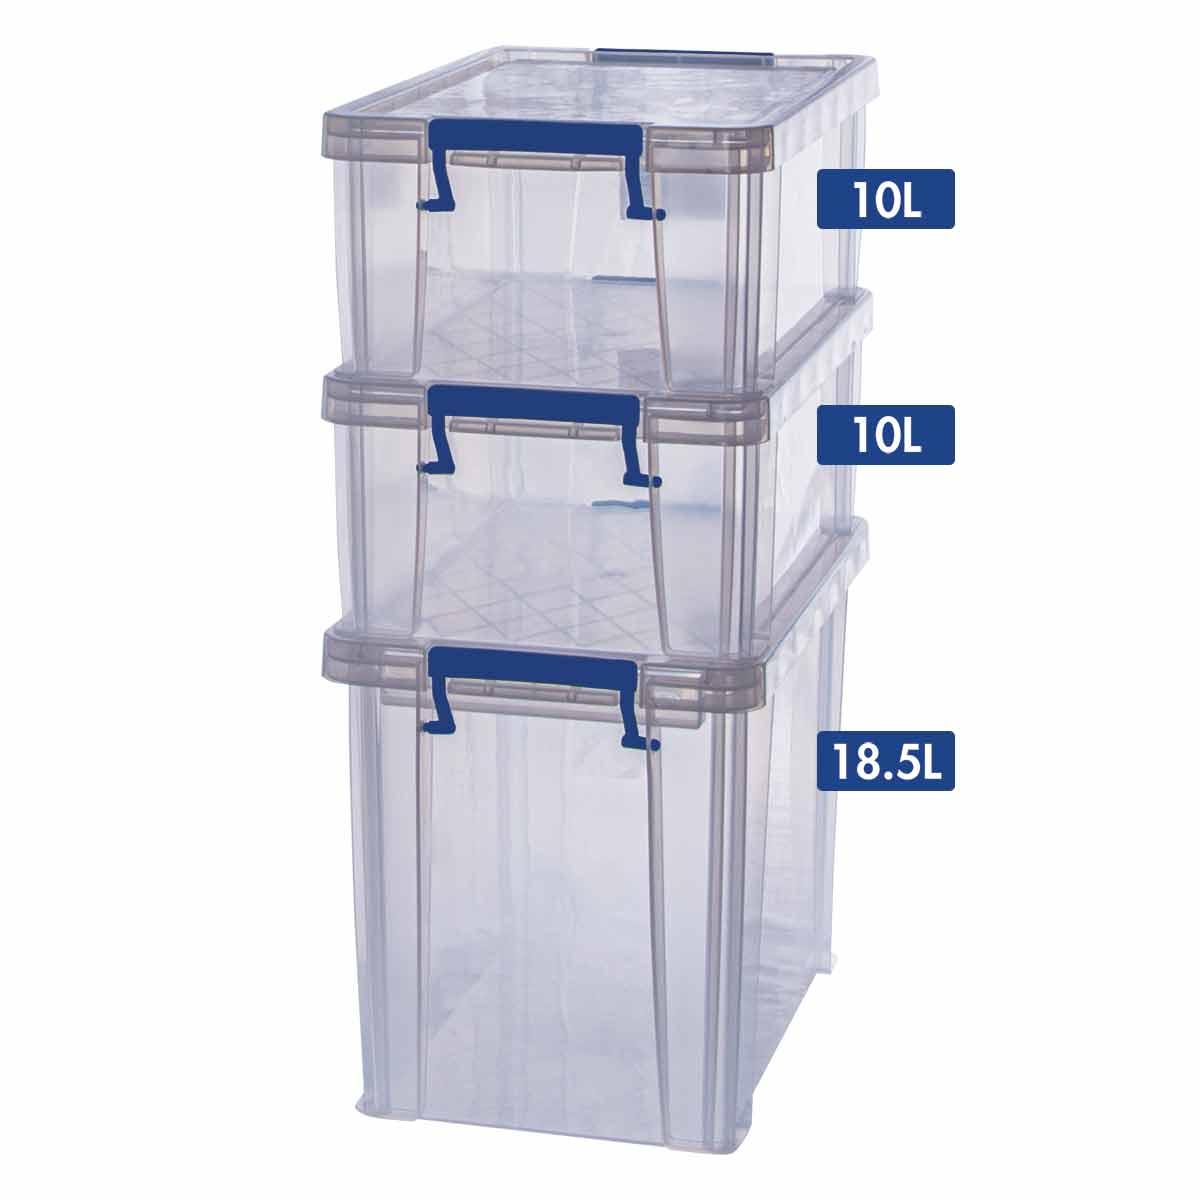 Image of ProStore Storage Box Bonus Pack 4 38.5L Capacity, Clear